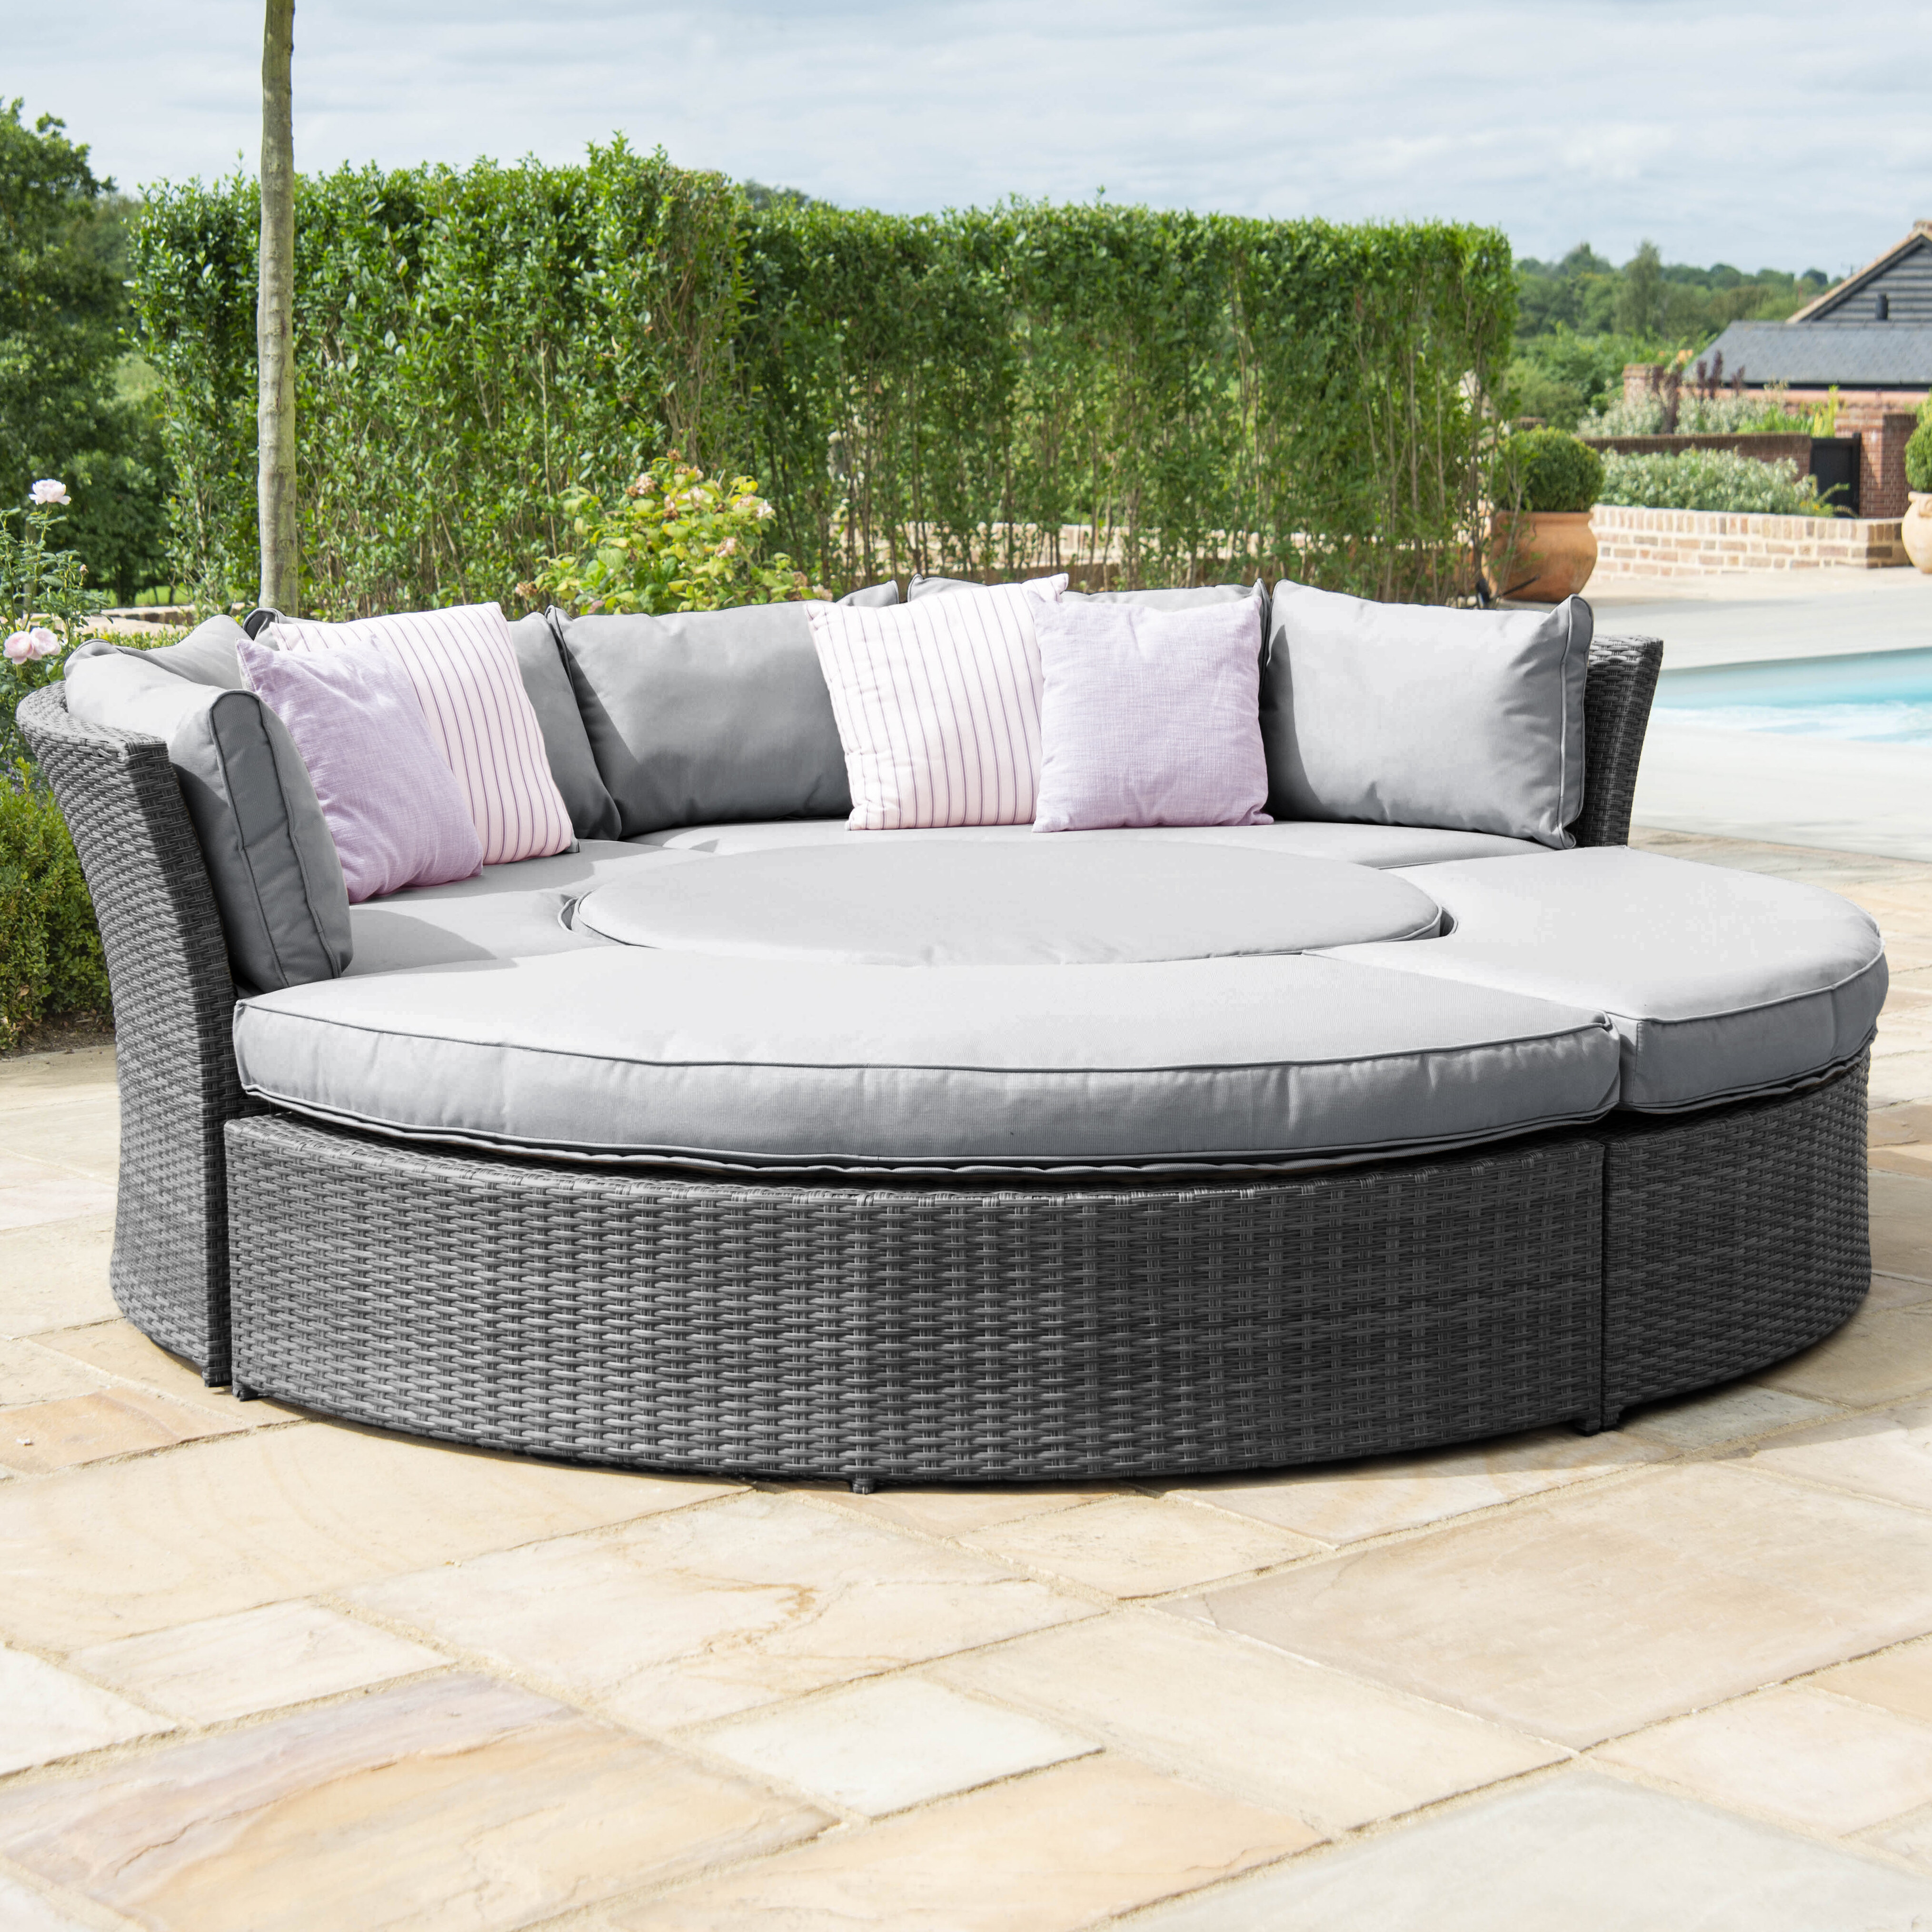 Sol 72 Outdoor Marysville 8 Seater Rattan Sofa Set Wayfair Co Uk